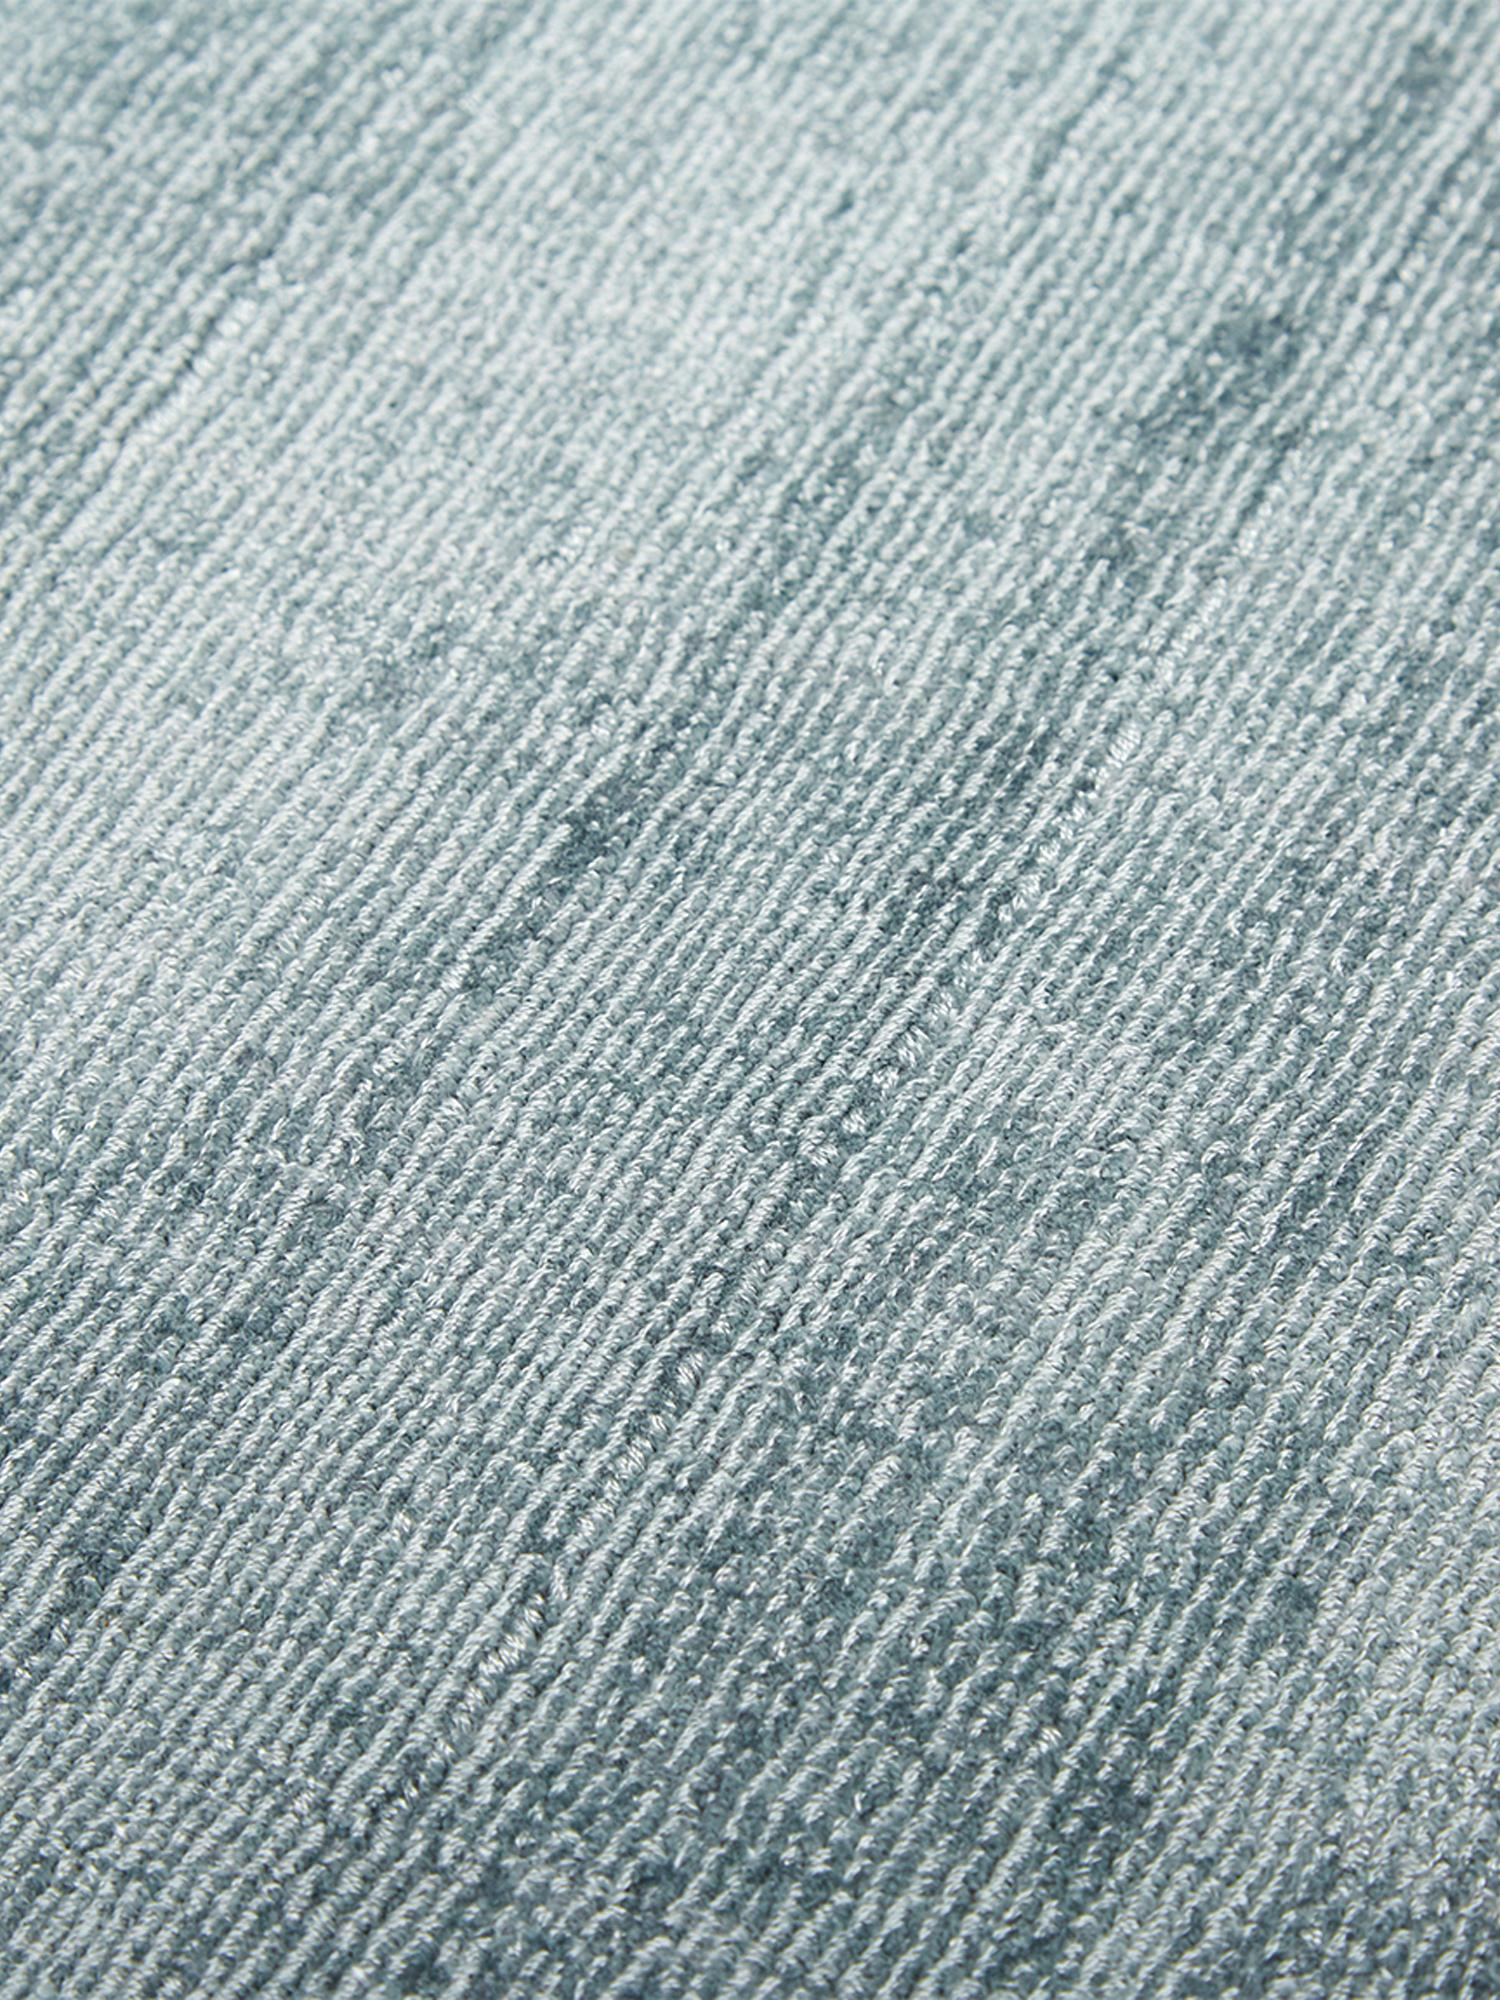 Handgewebter Viskoseteppich Jane in Eisblau, Flor: 100% Viskose, Eisblau, B 160 x L 230 cm (Grösse M)